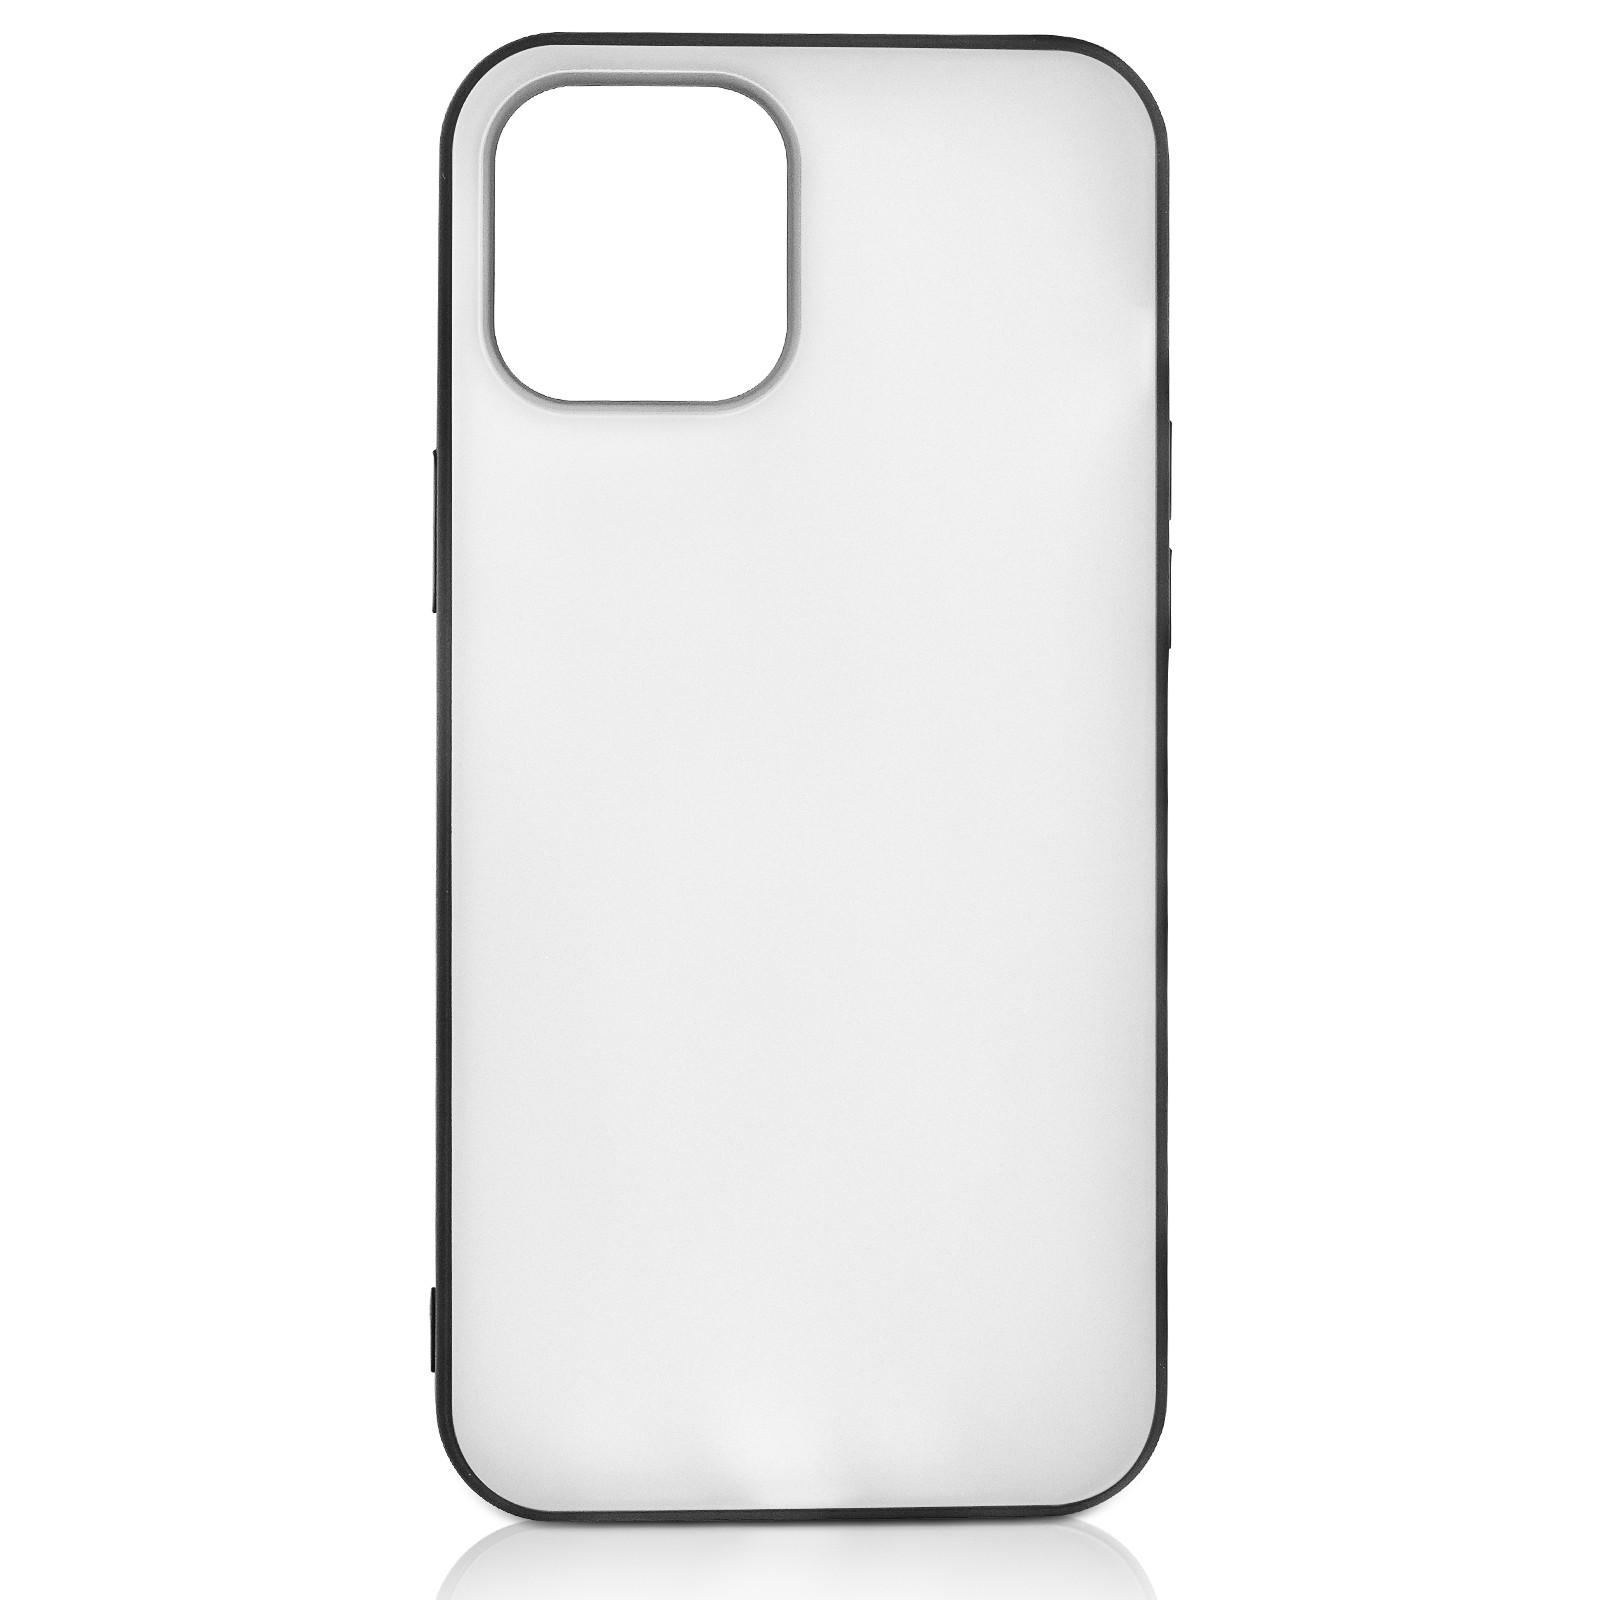 Capac protectie spate cellara colectia shade pentru iphone 12 pro max - negru